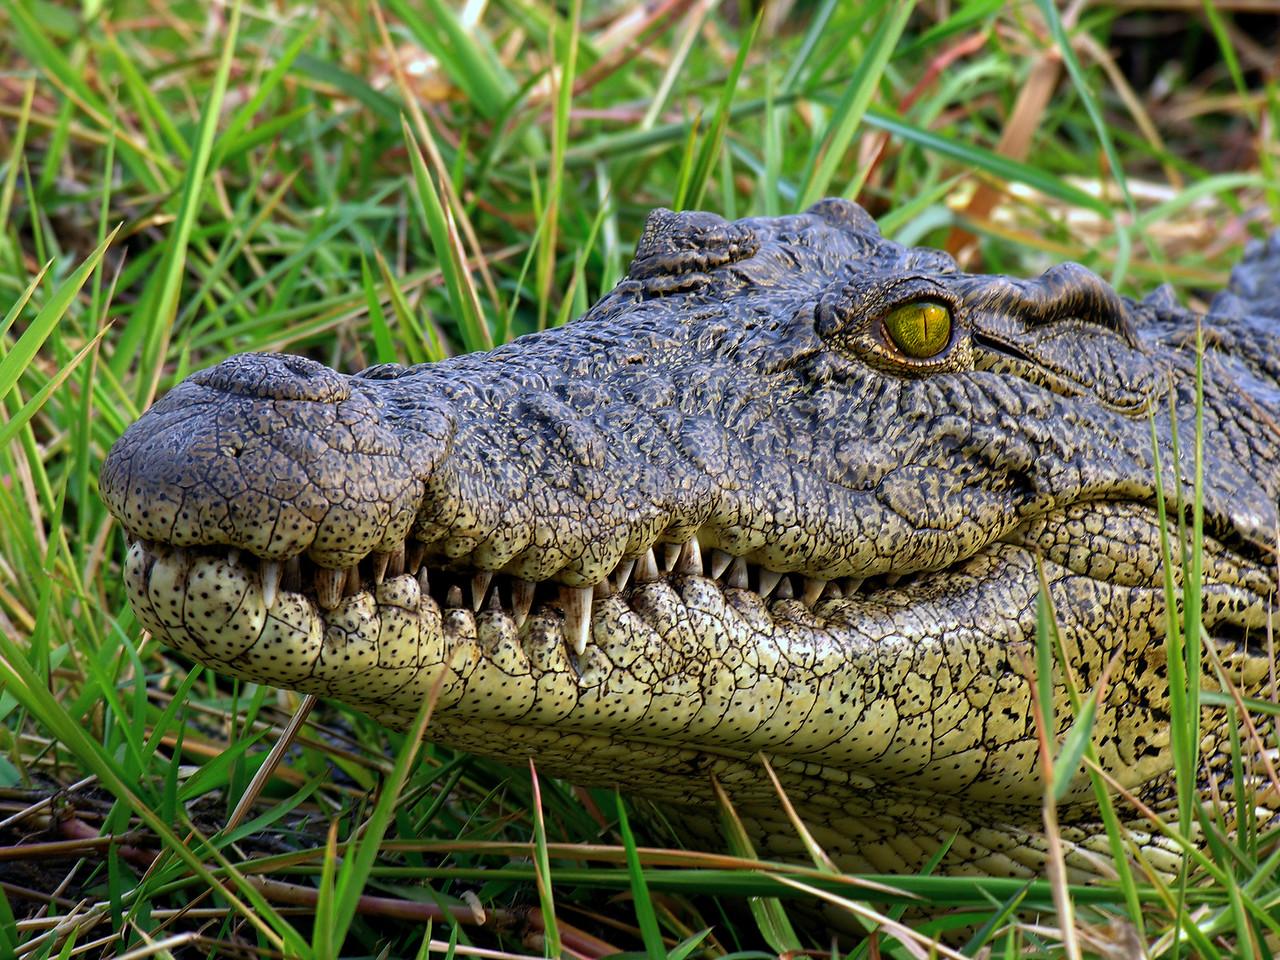 CROCODILE - BOTSWANA